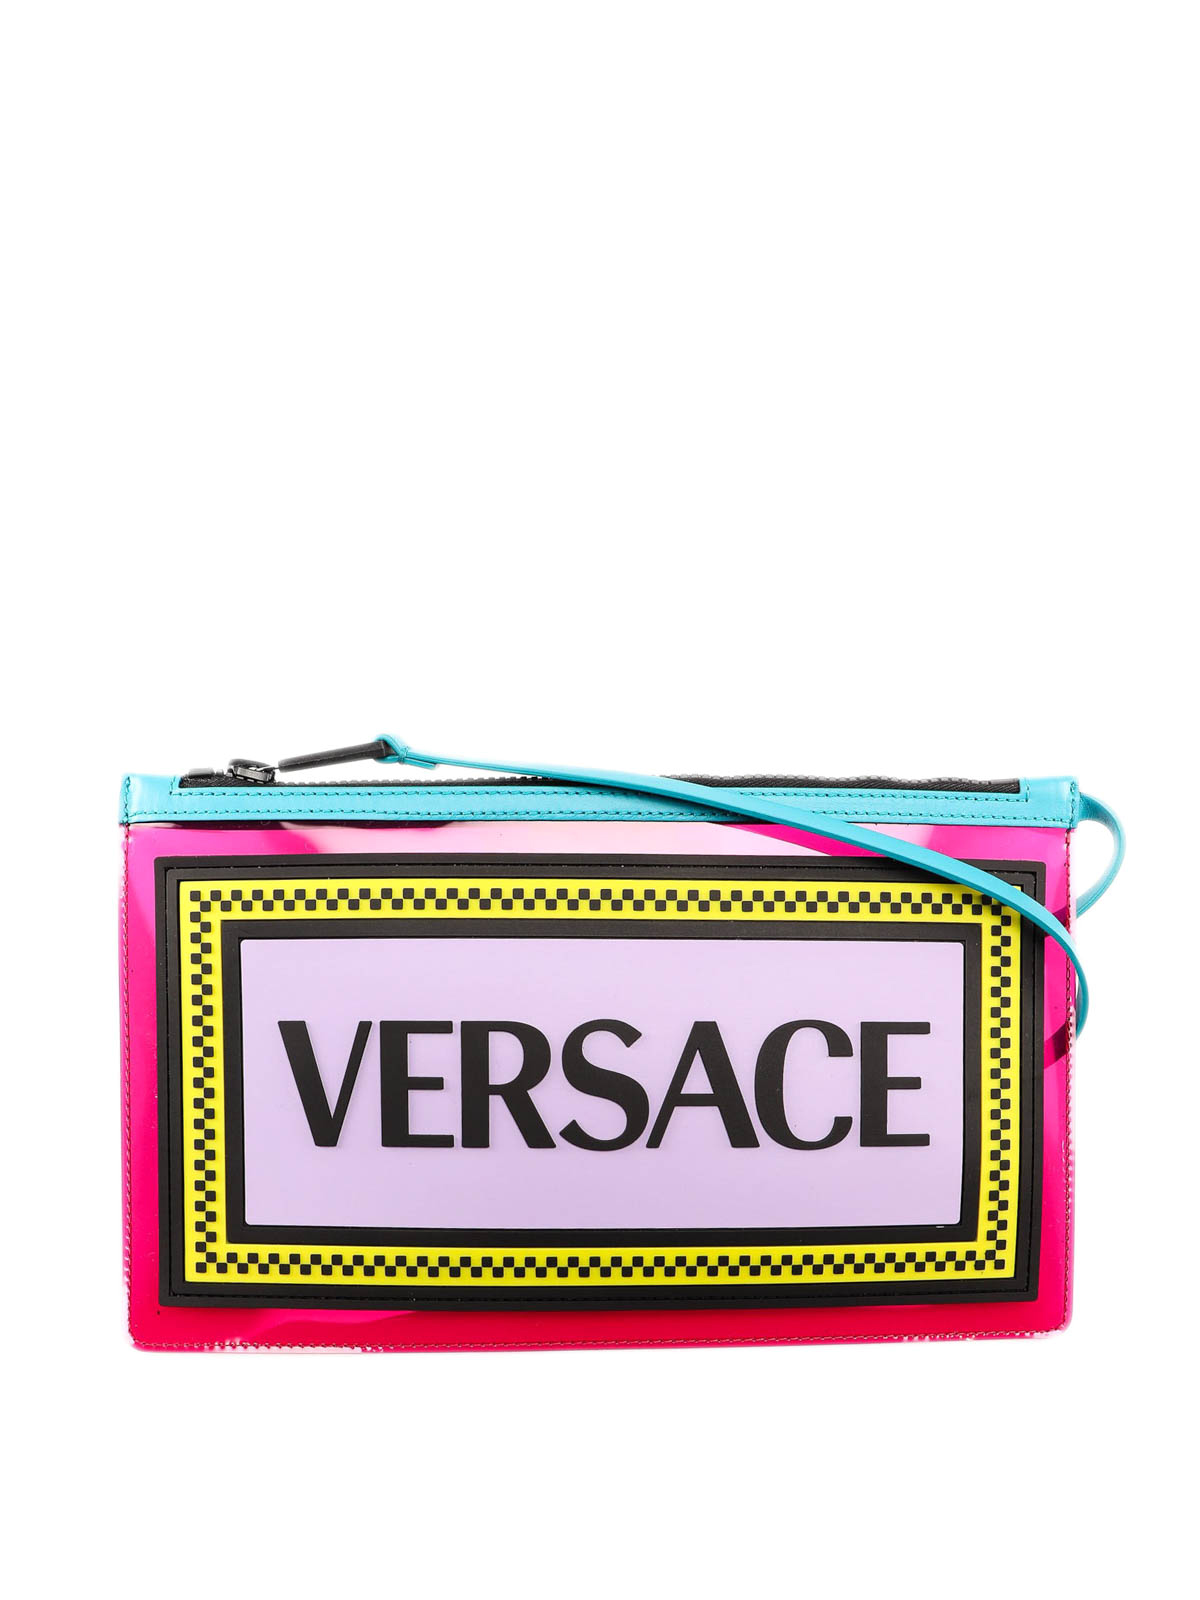 9ada8cd231 Versace - 90s Vintage logo clutch - clutches - DP8G957D3PVC DF5MT